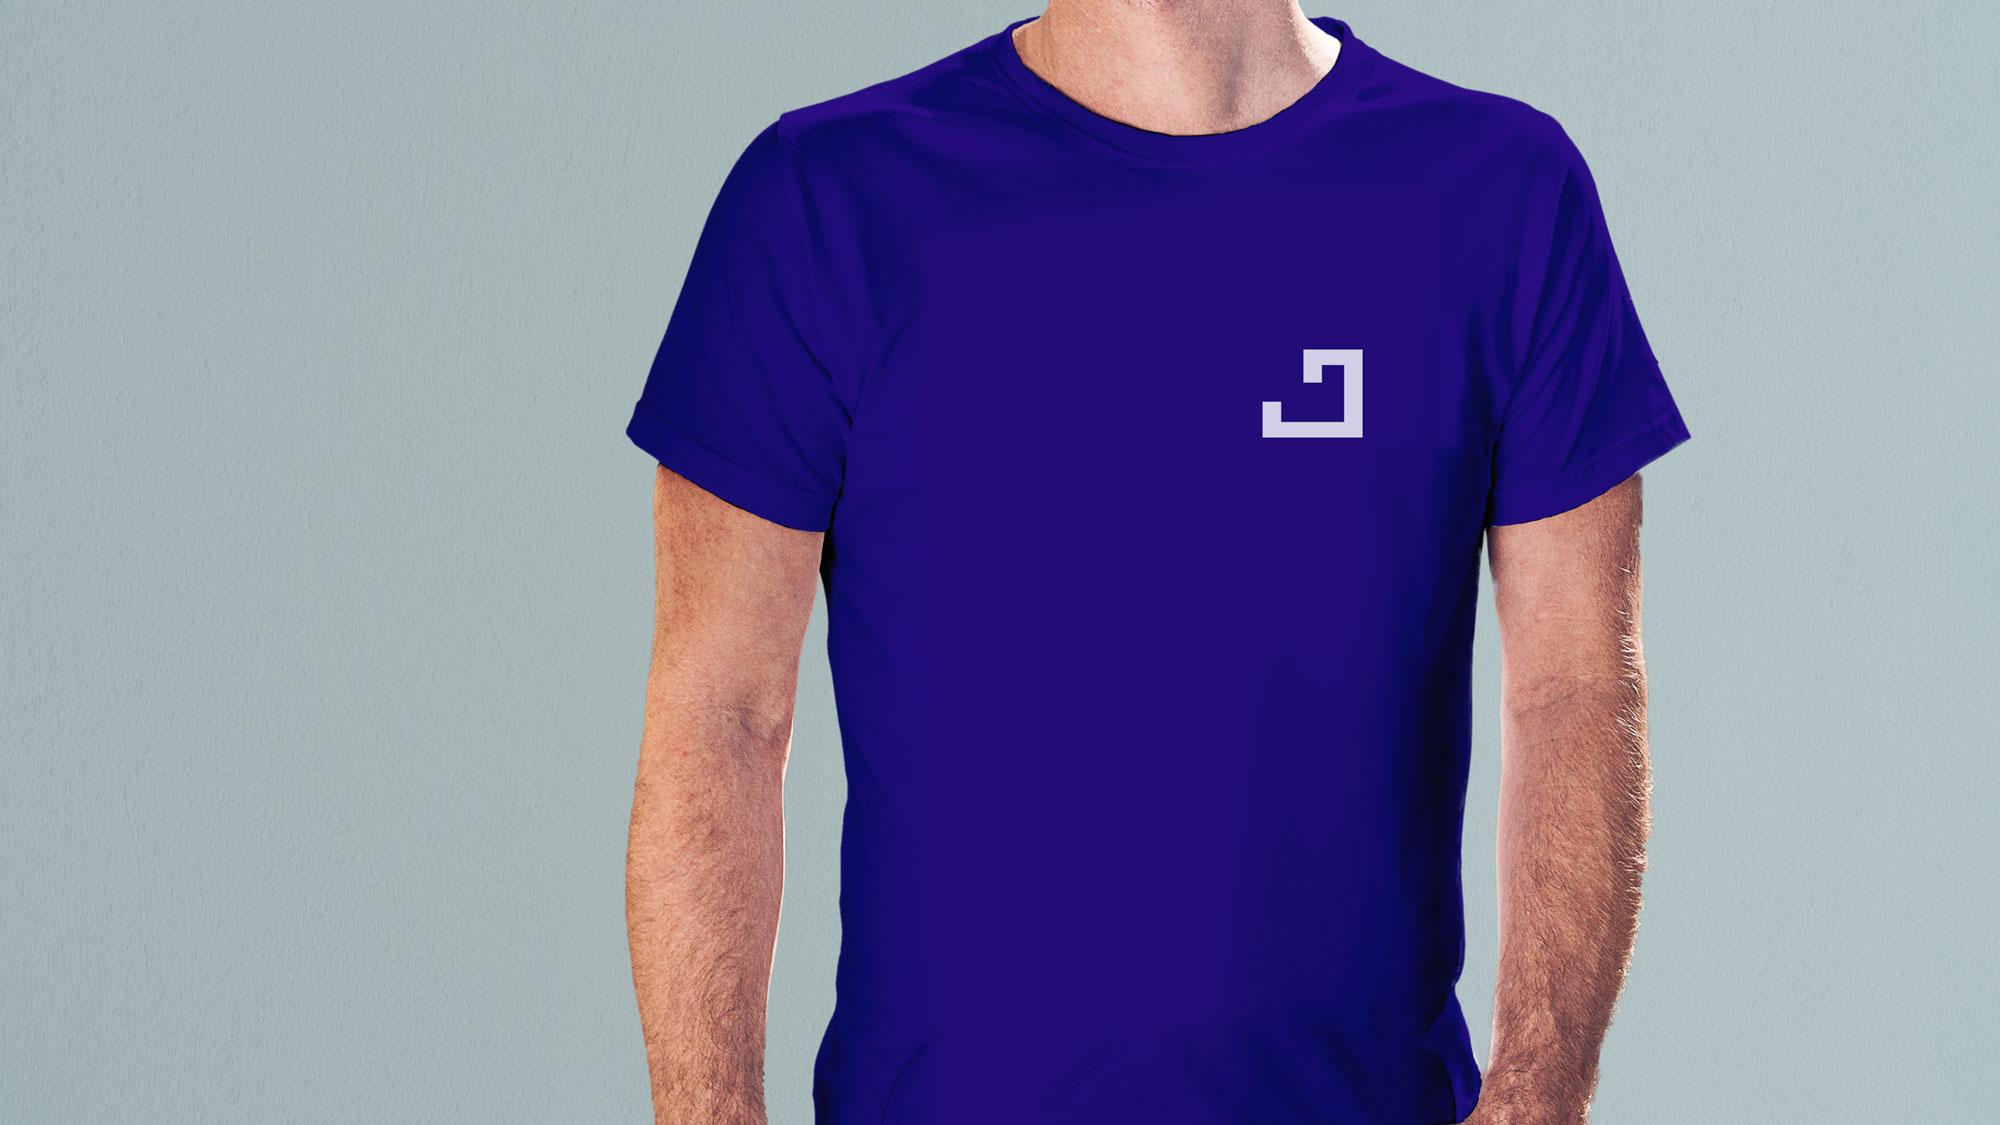 Droguerie Fikri Sanitaire Marrakech t-shirt